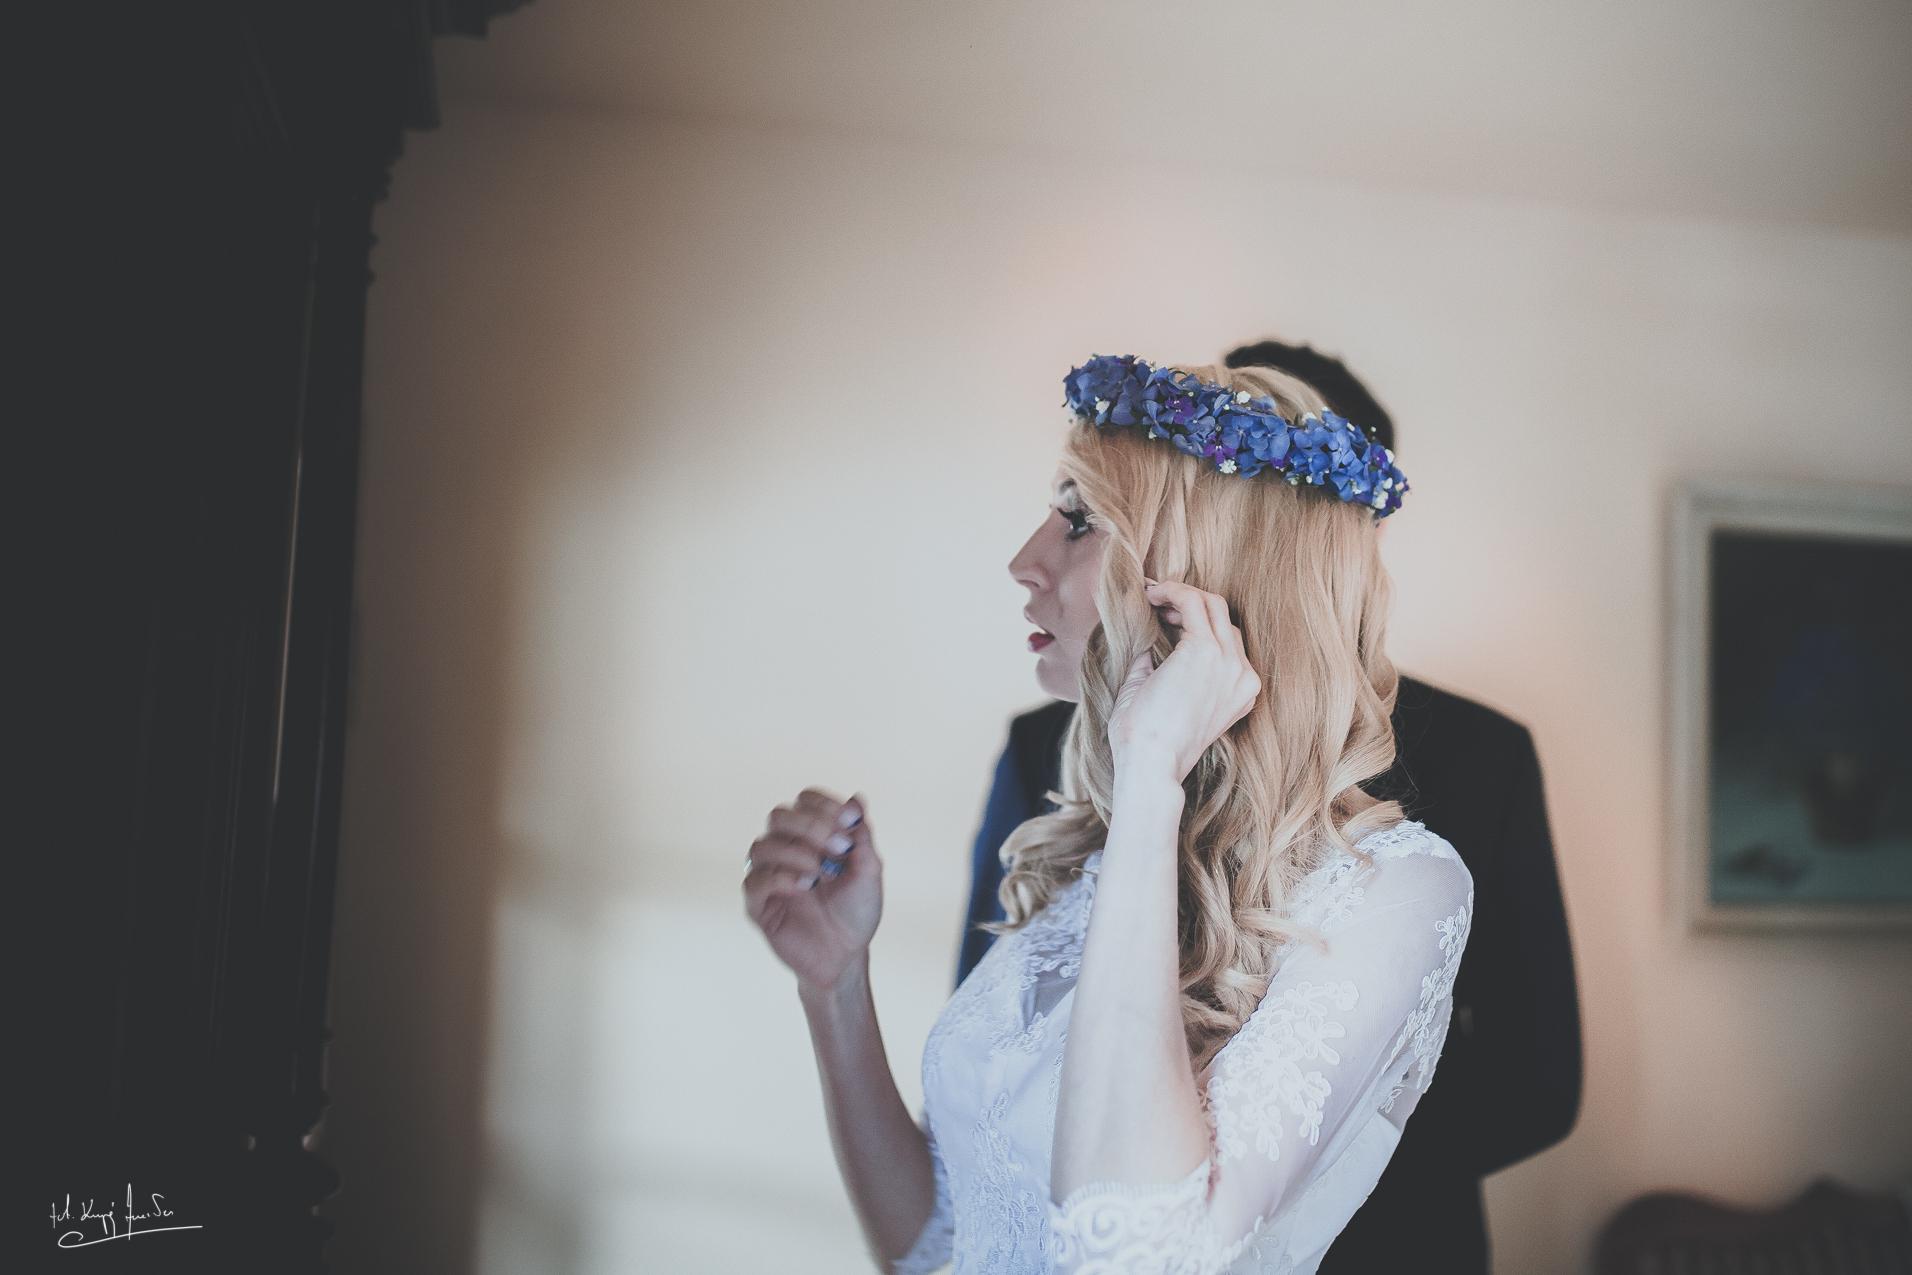 Ślub wesele szklarska poręba 13 Marta & Sławek